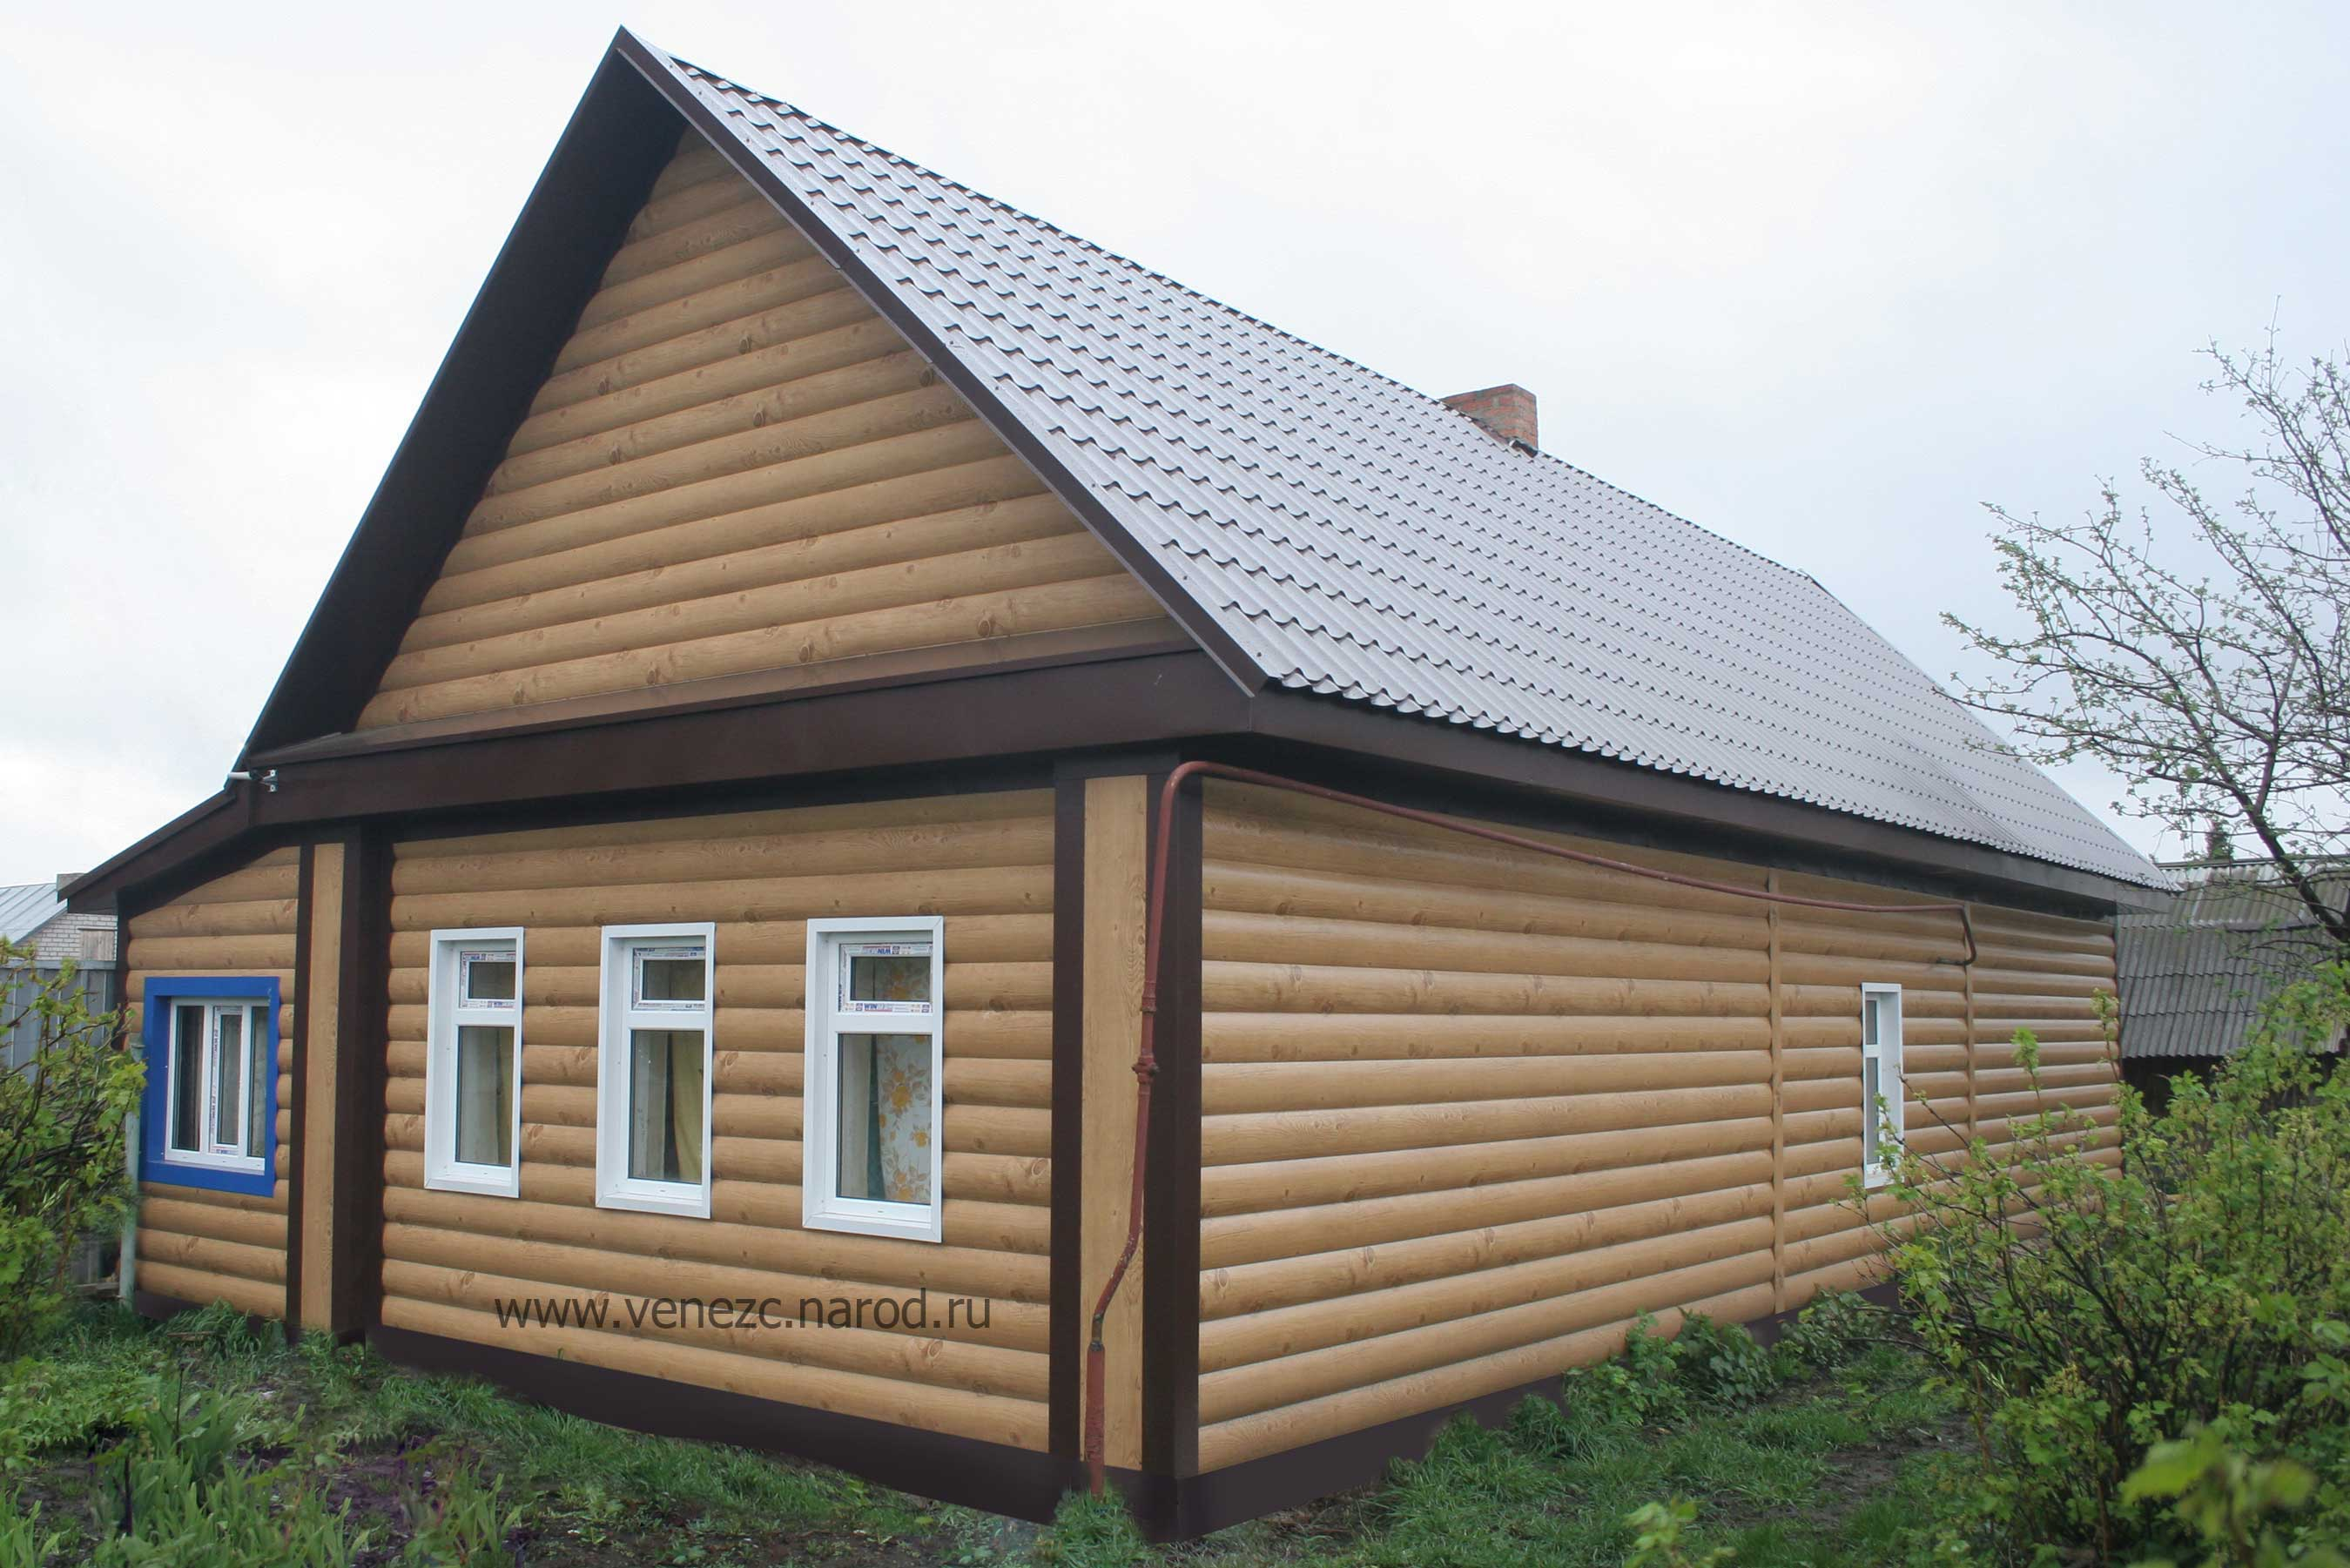 Обшивка деревянного дома сайдингом фото